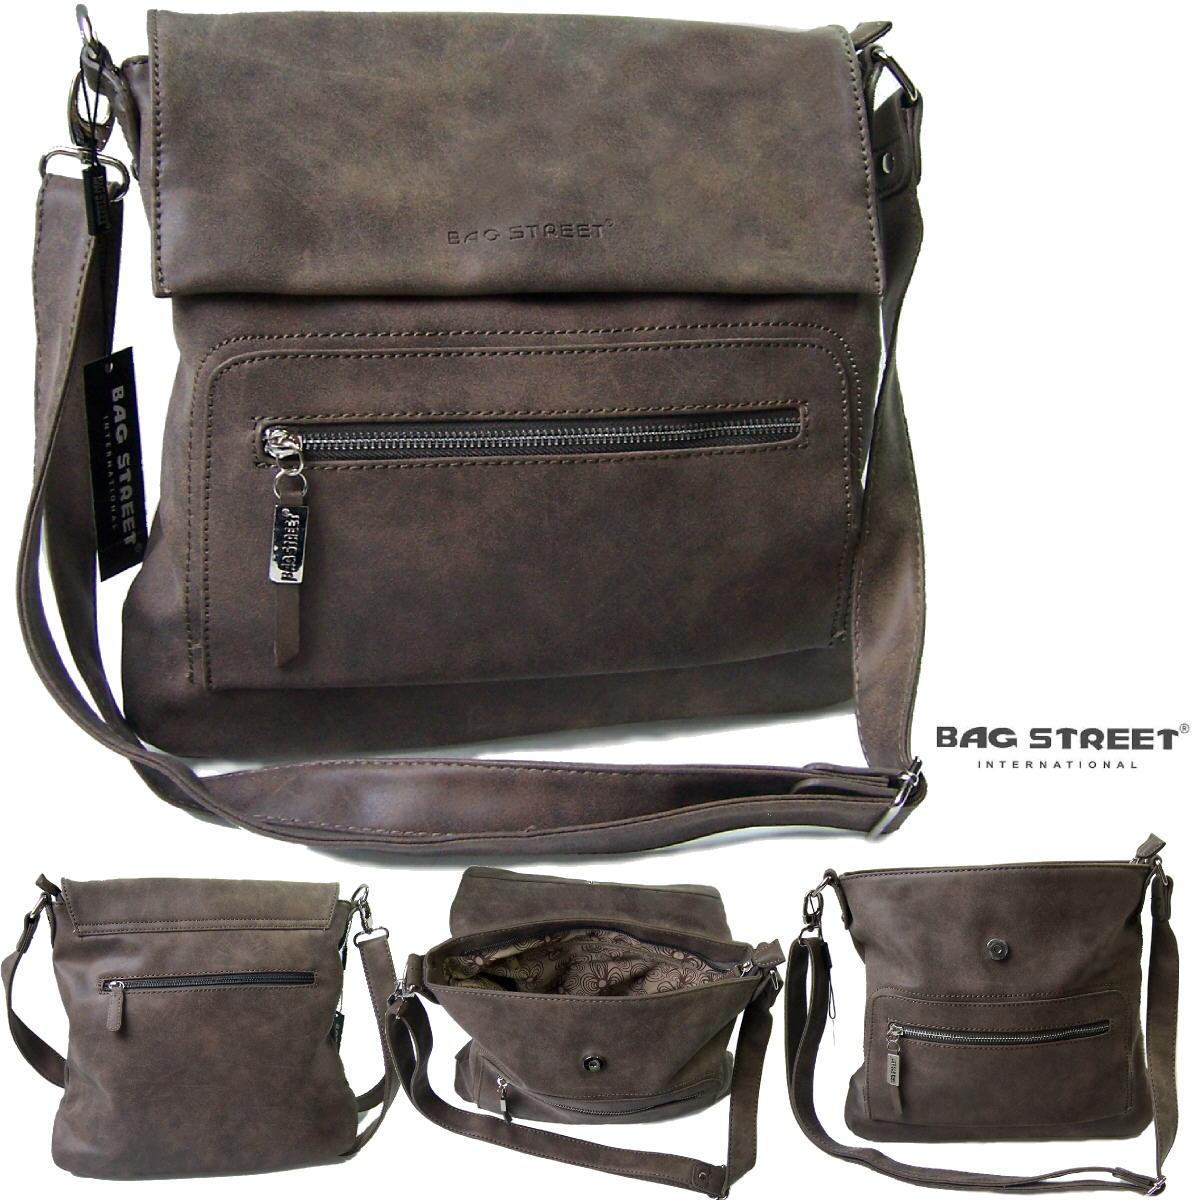 Tasche Umhängetasche Handtasche Leder-Look taupe Bag Street Ta7006*